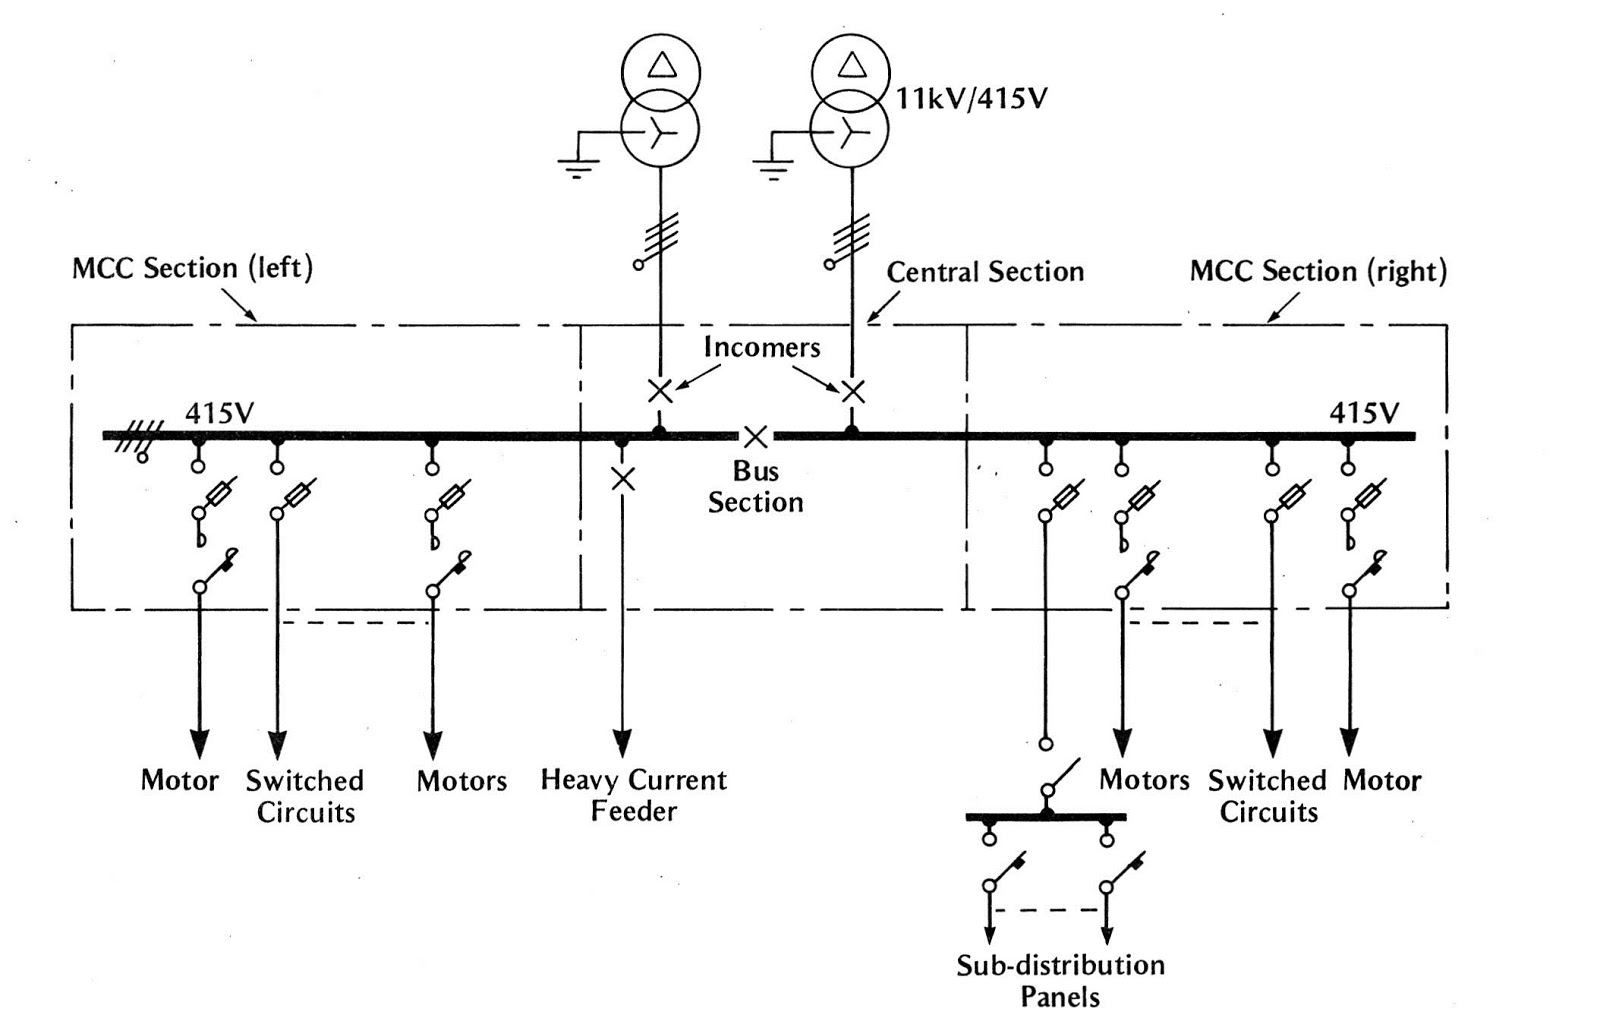 low voltage wiring diagram symbols chapter 3 low voltage switchgear lekule blog design [ 1600 x 1021 Pixel ]